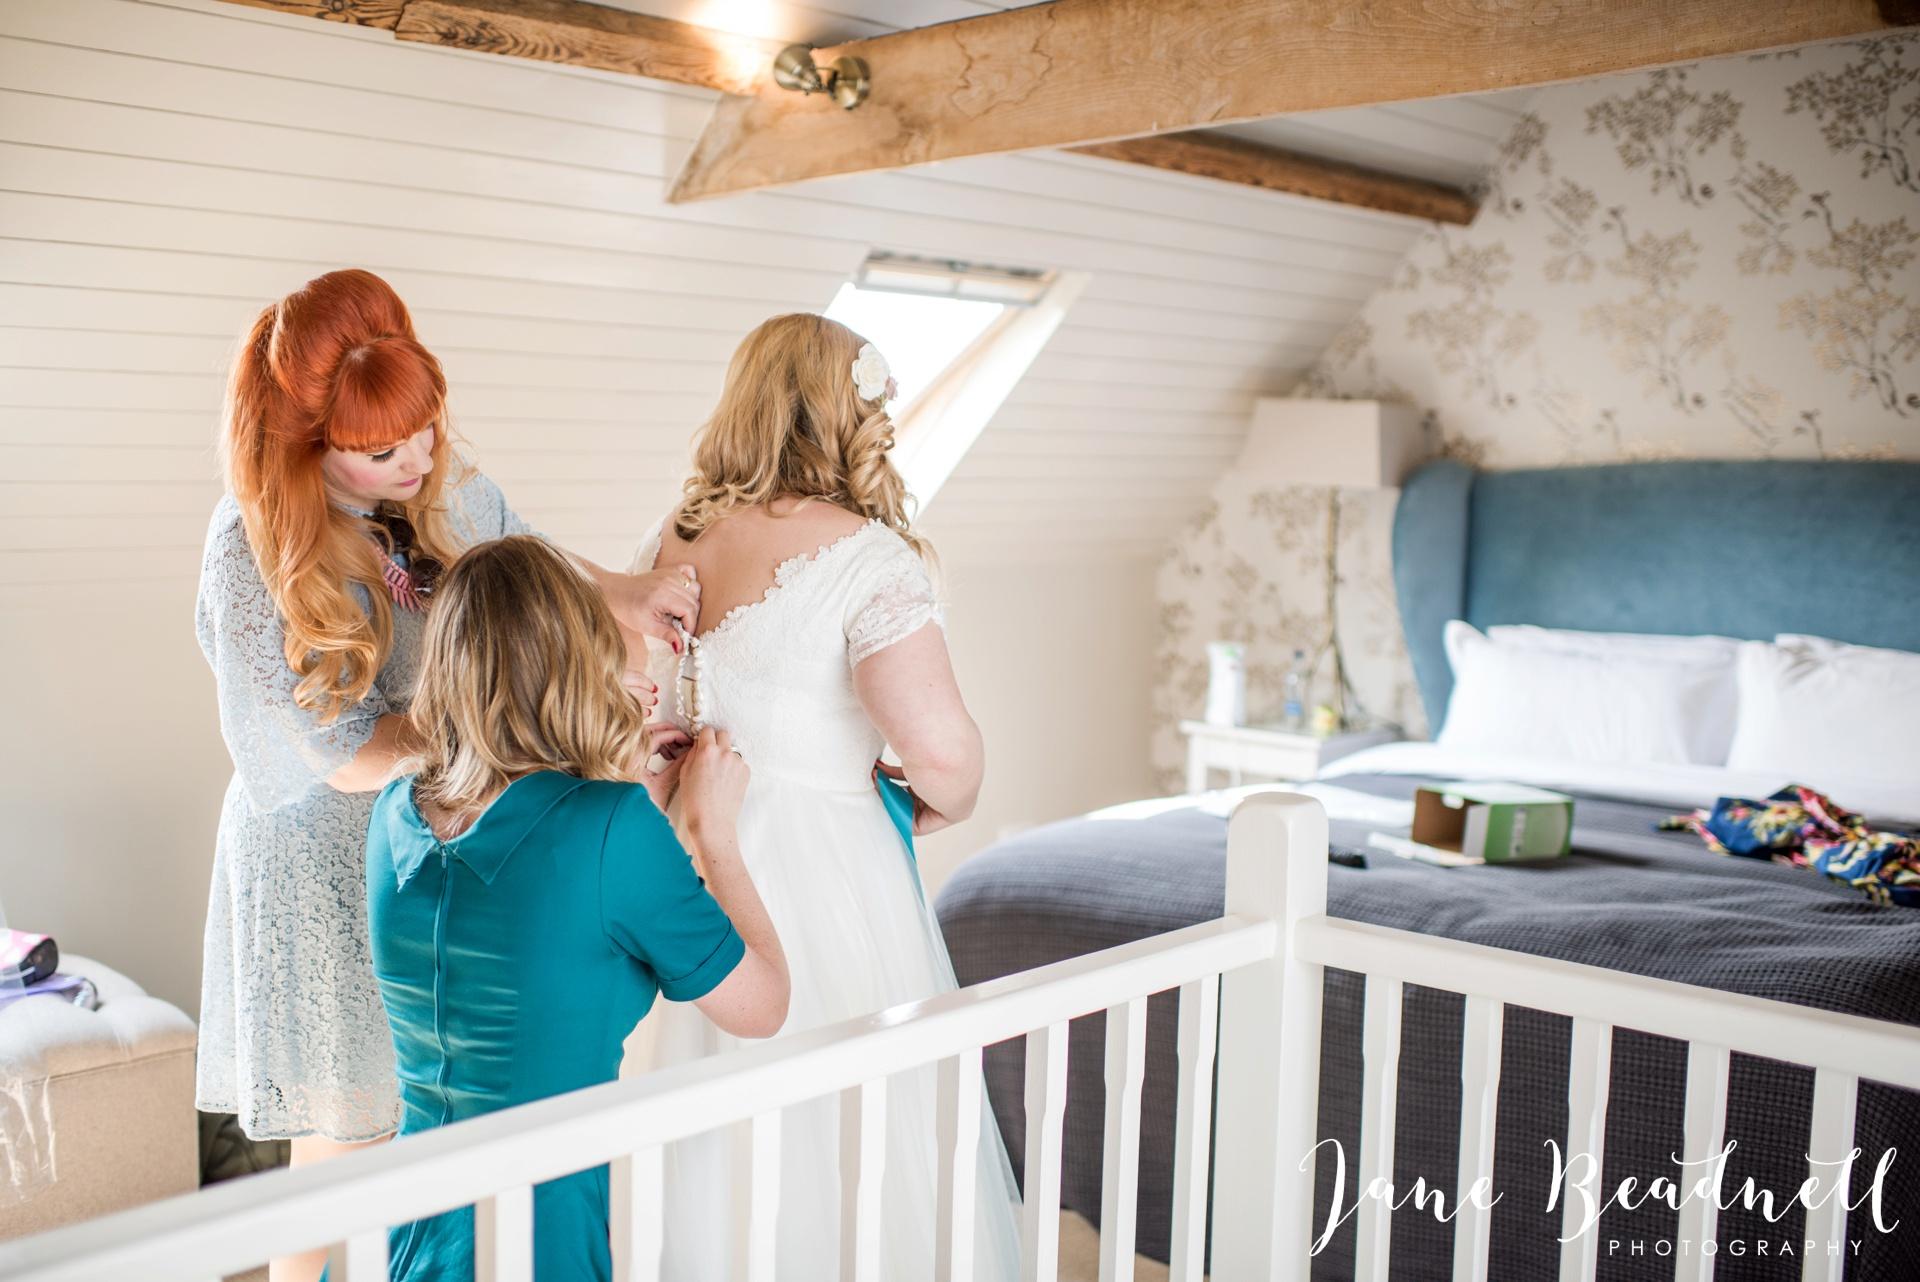 South Farm Wedding photography Hertfordshire by Jane Beadnell Photography fine art wedding photographer_0017